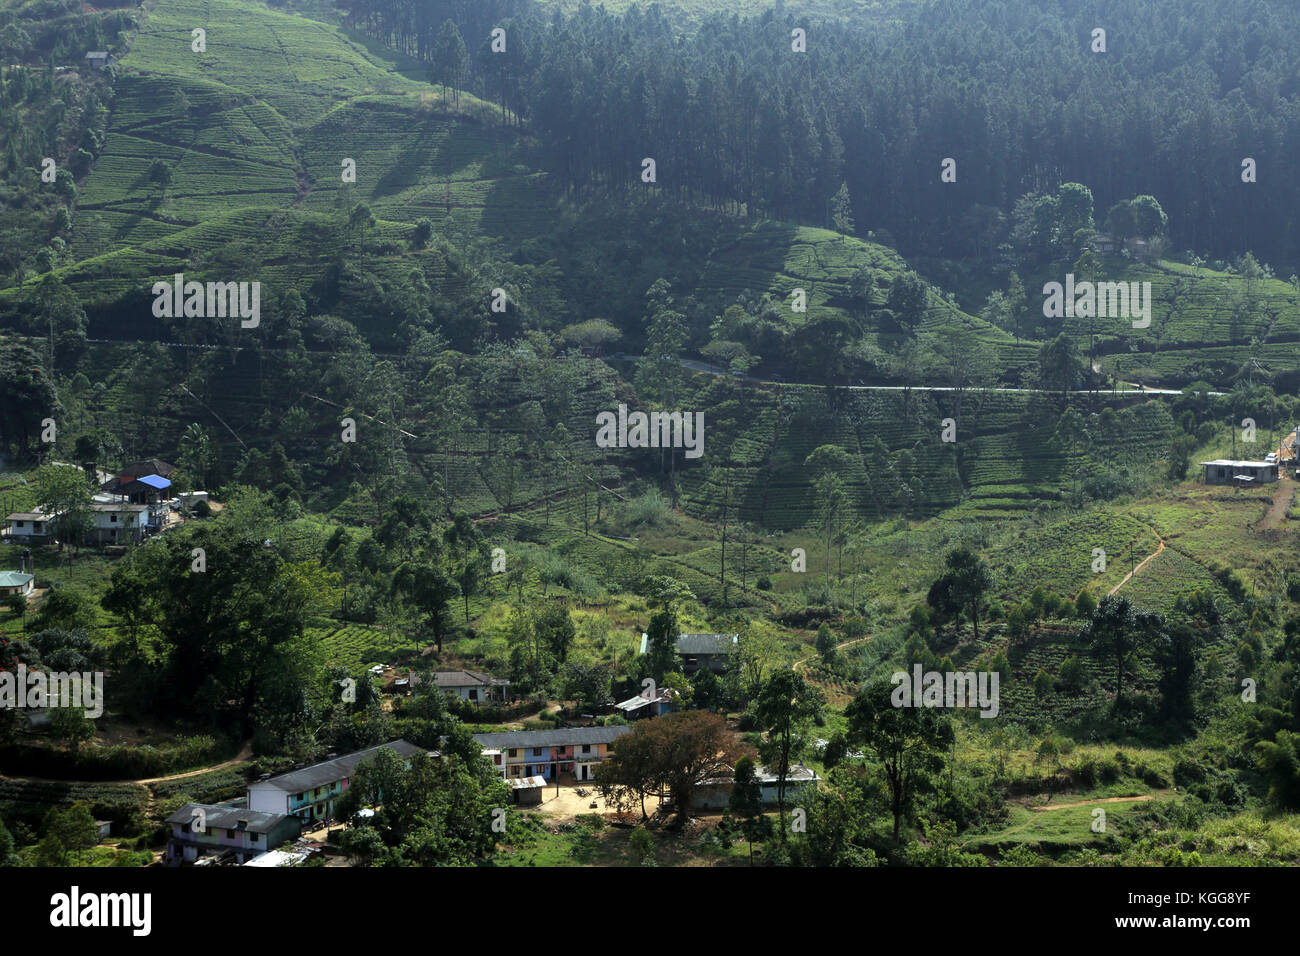 Tea Plantation near Nuwara Eliya Hill Country Central Province Sri Lanka Stock Photo